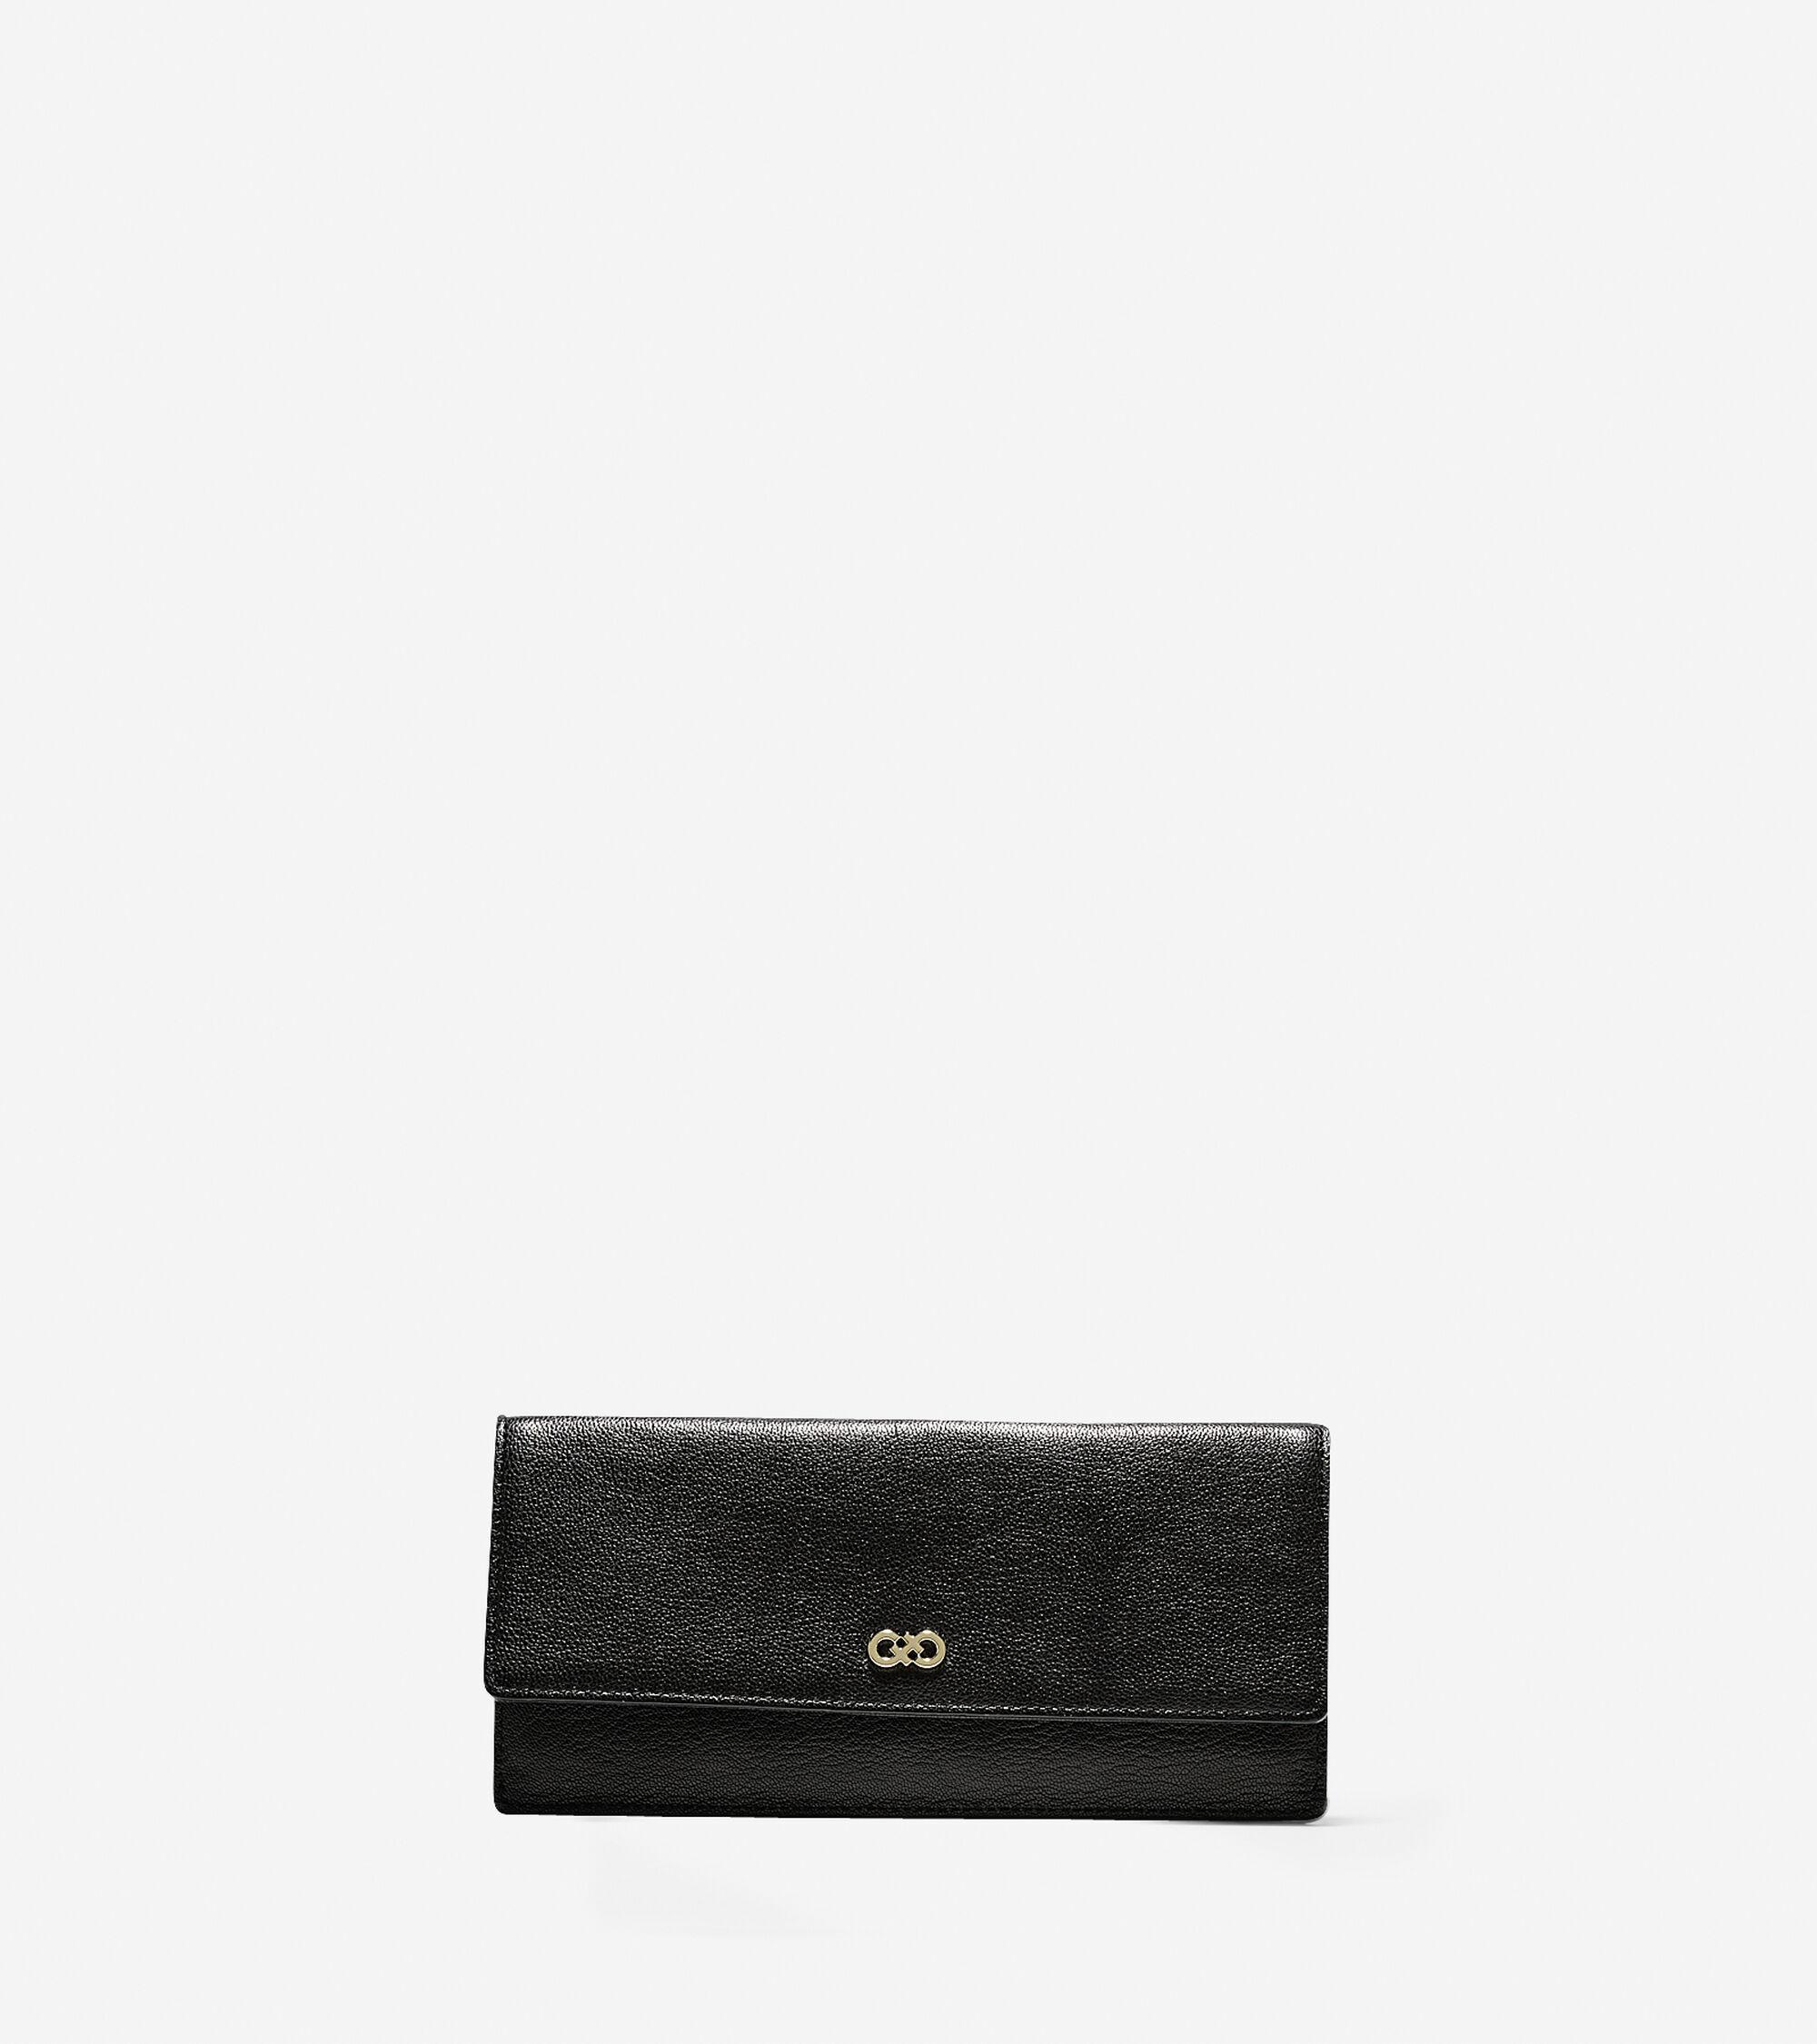 Accessories > Reddington Slim Flap Wallet